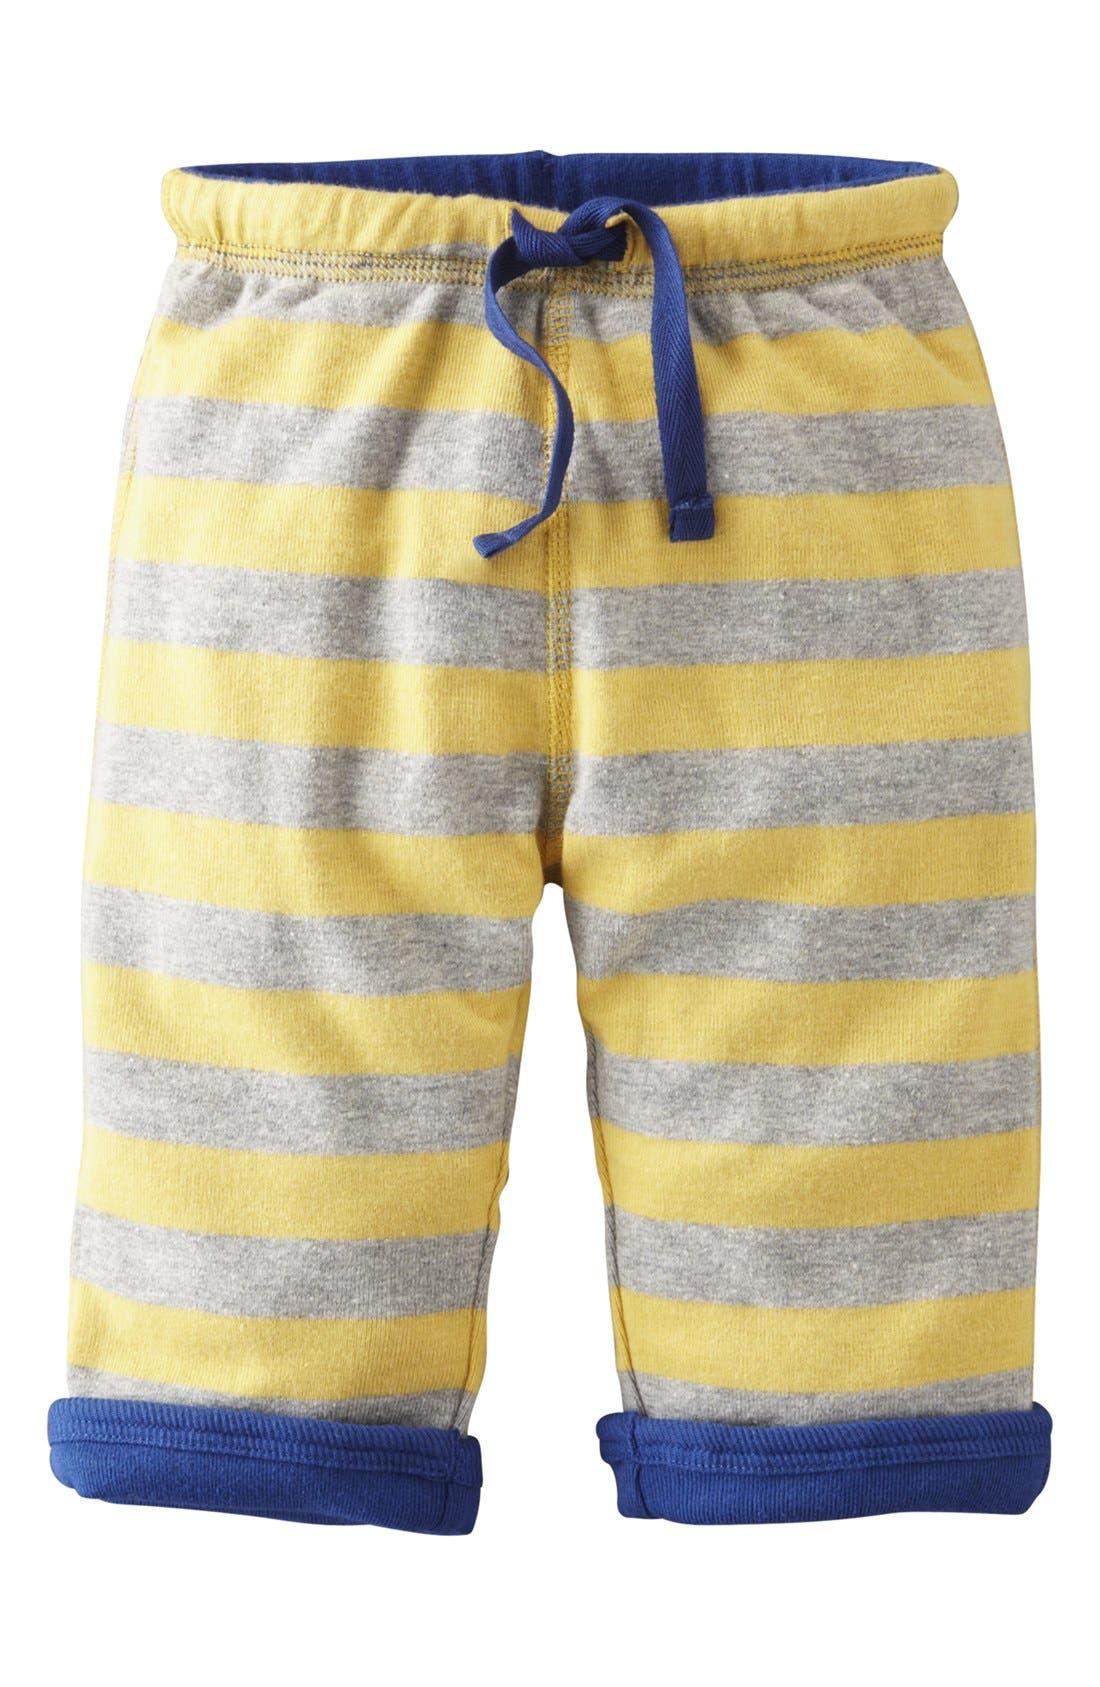 Main Image - Mini Boden 'Baggies' Reversible Jersey Pants (Baby Boys)